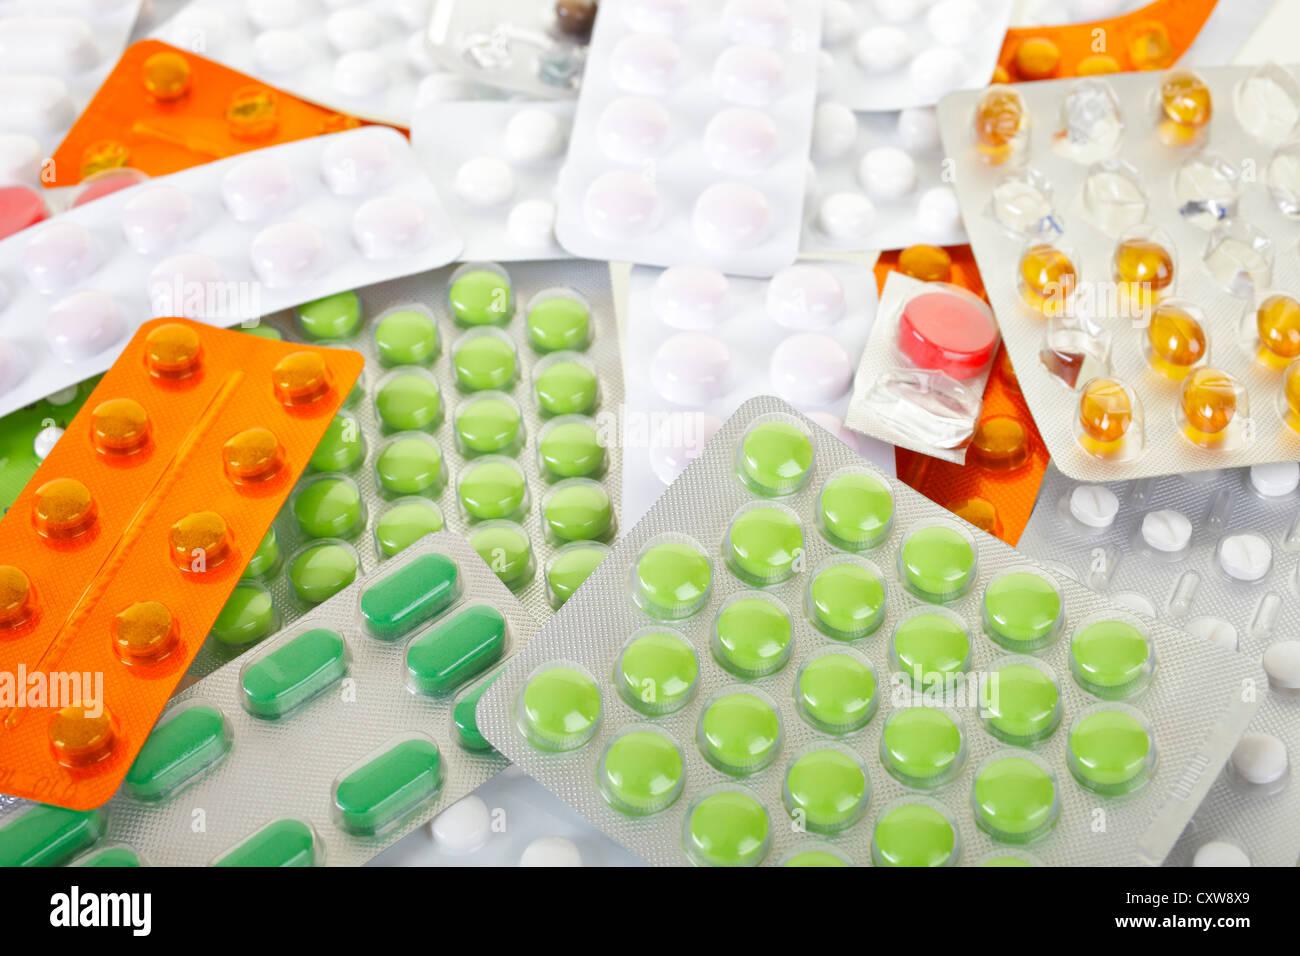 pill - Stock Image